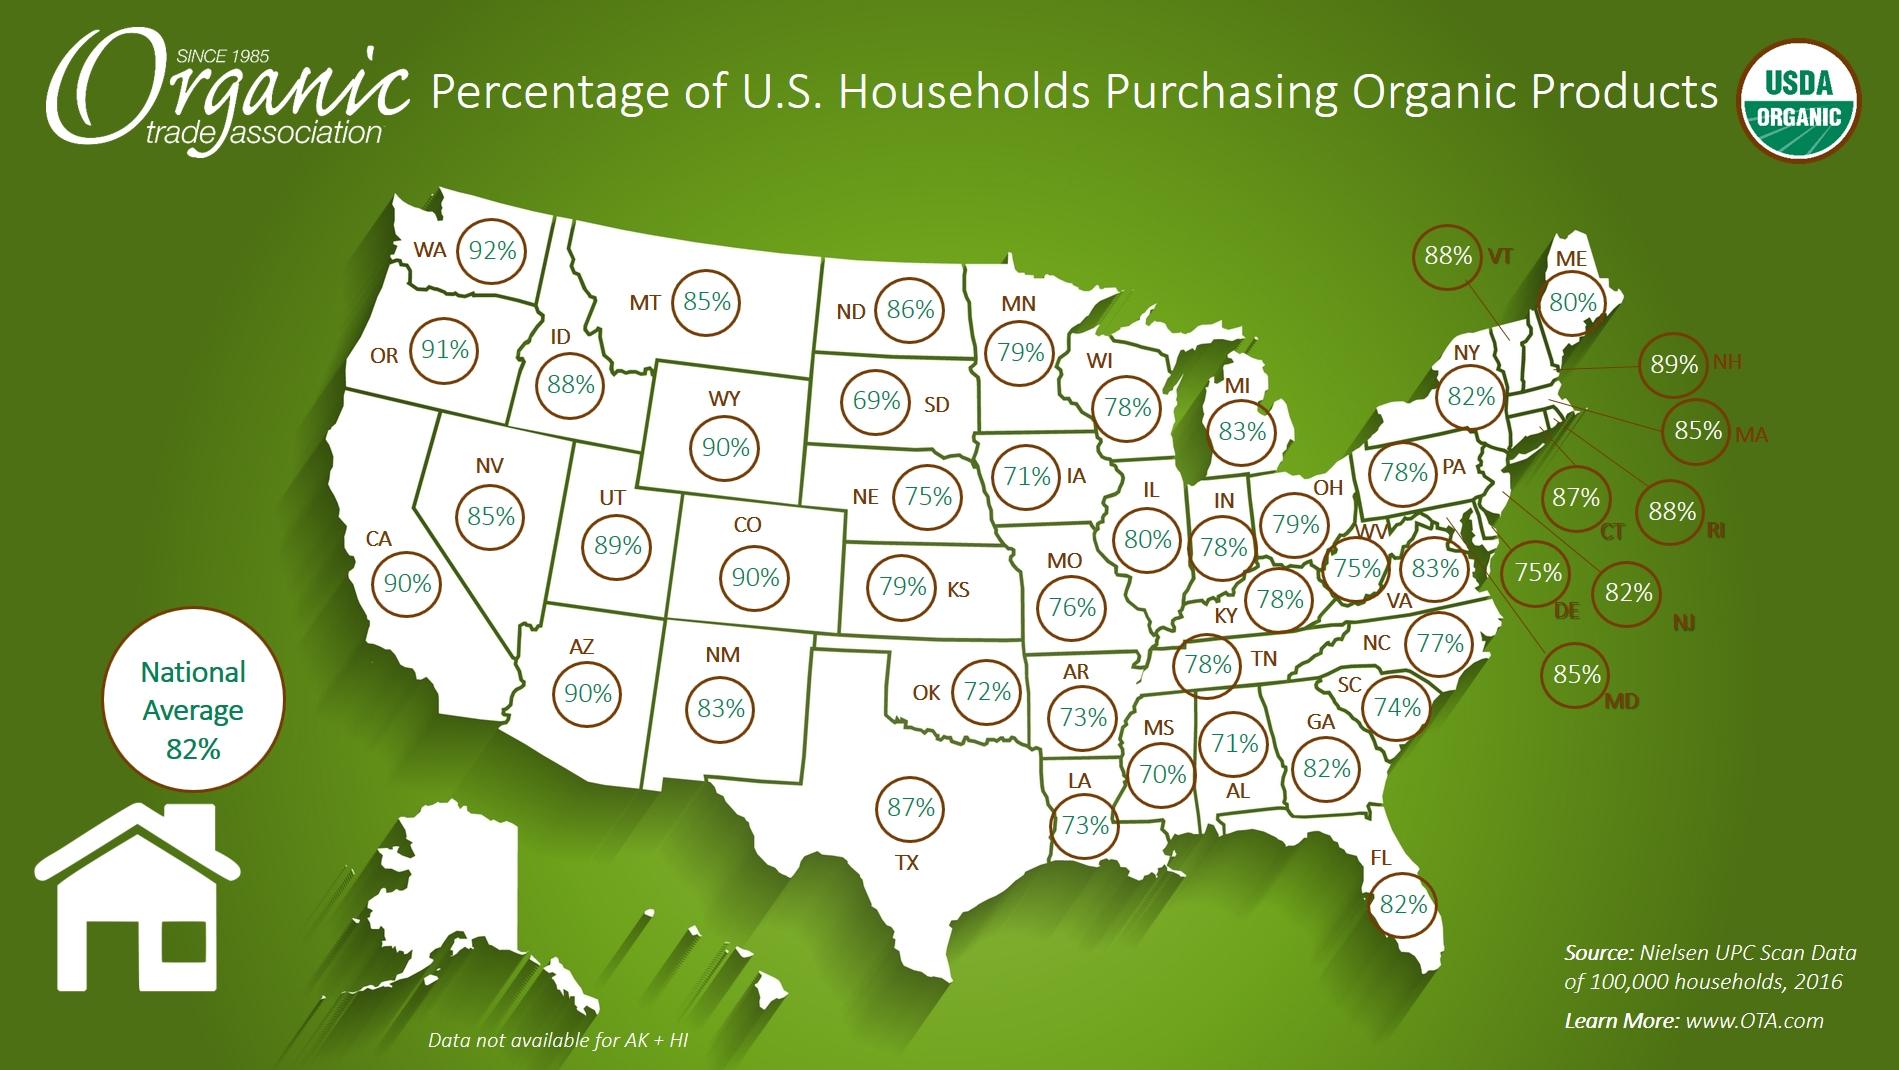 Organic Household Purchasing Map